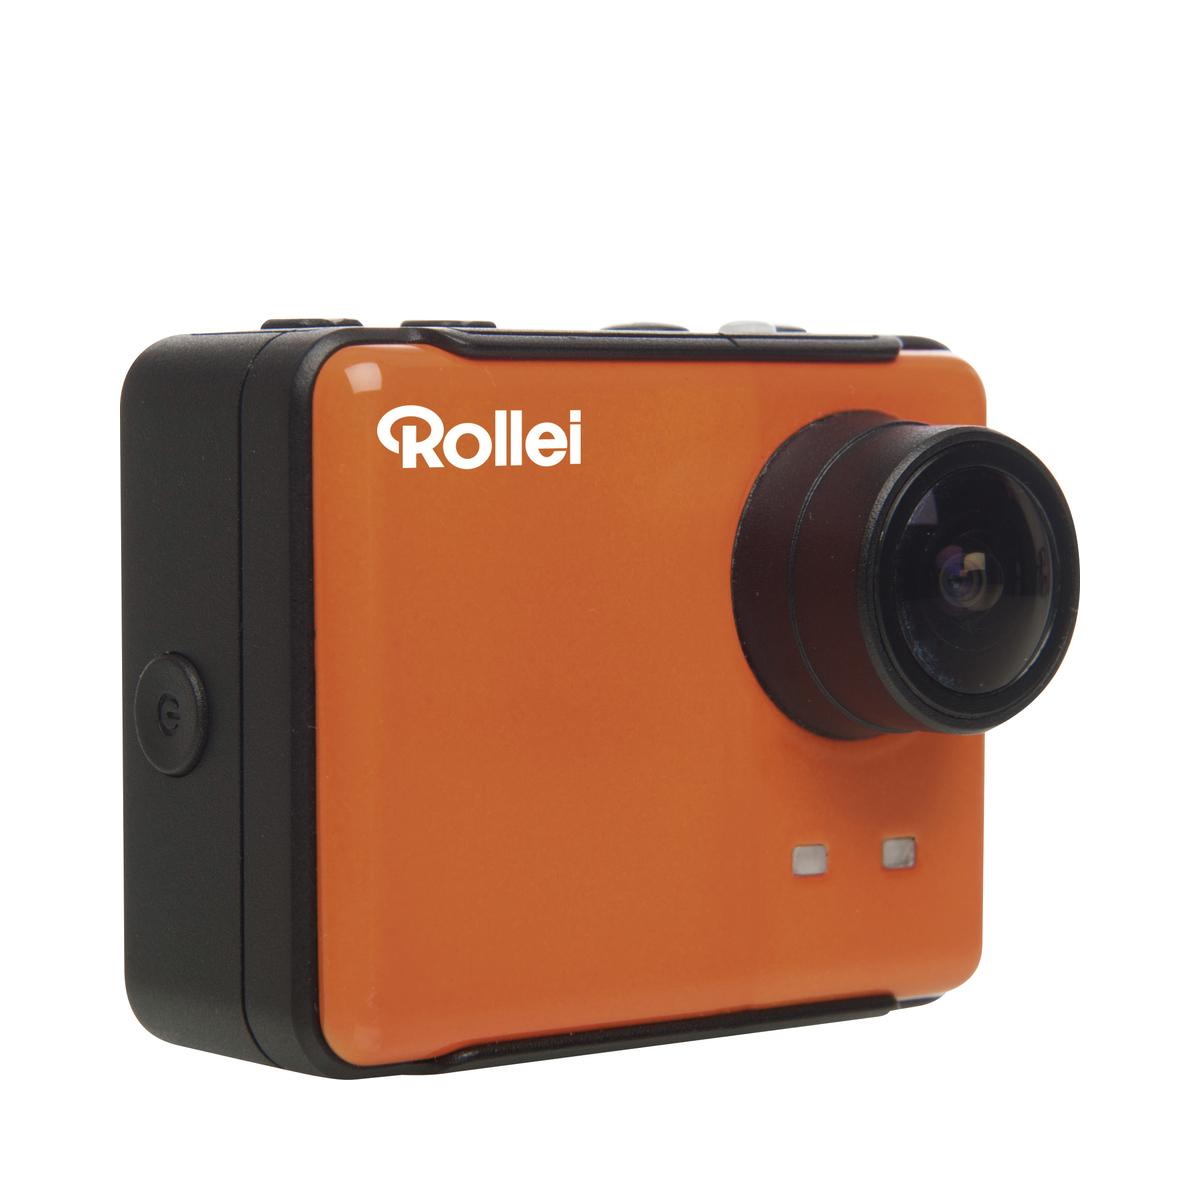 action-camera-rollei-s50-wifi-standard-orange.jpg